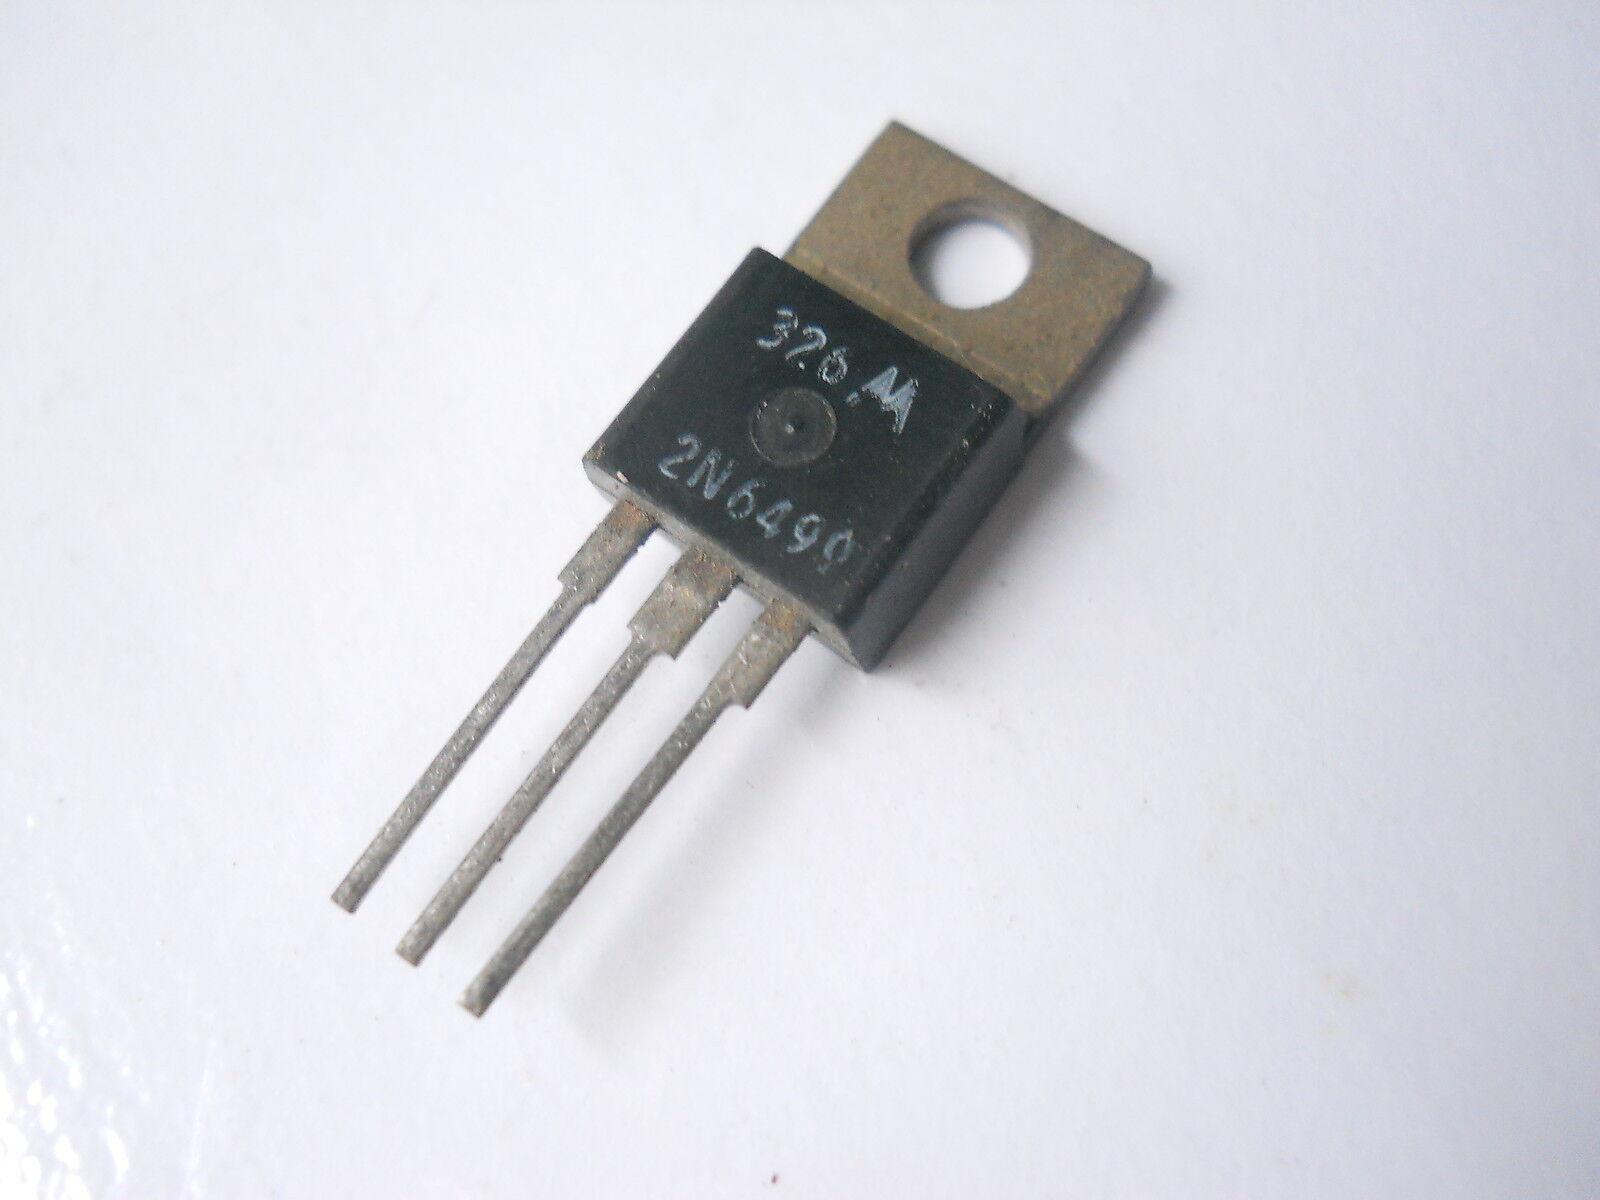 O28 QTY 5 ea 2N6055 NPN Darlington Power Transistor 60 Volt 8 Amp